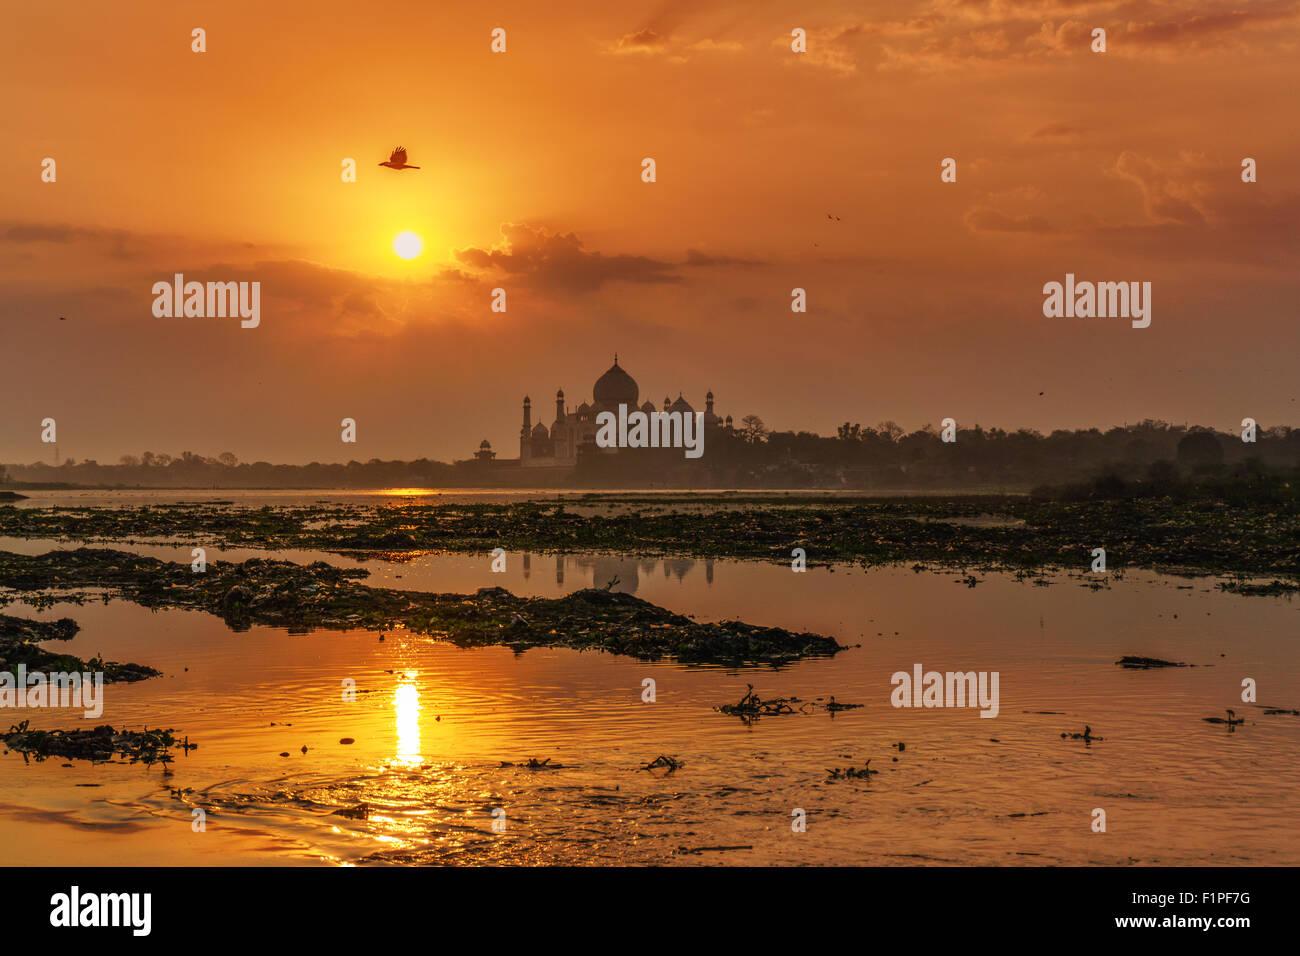 A sunrise view of Taj Mahal in Agra, India. - Stock Image